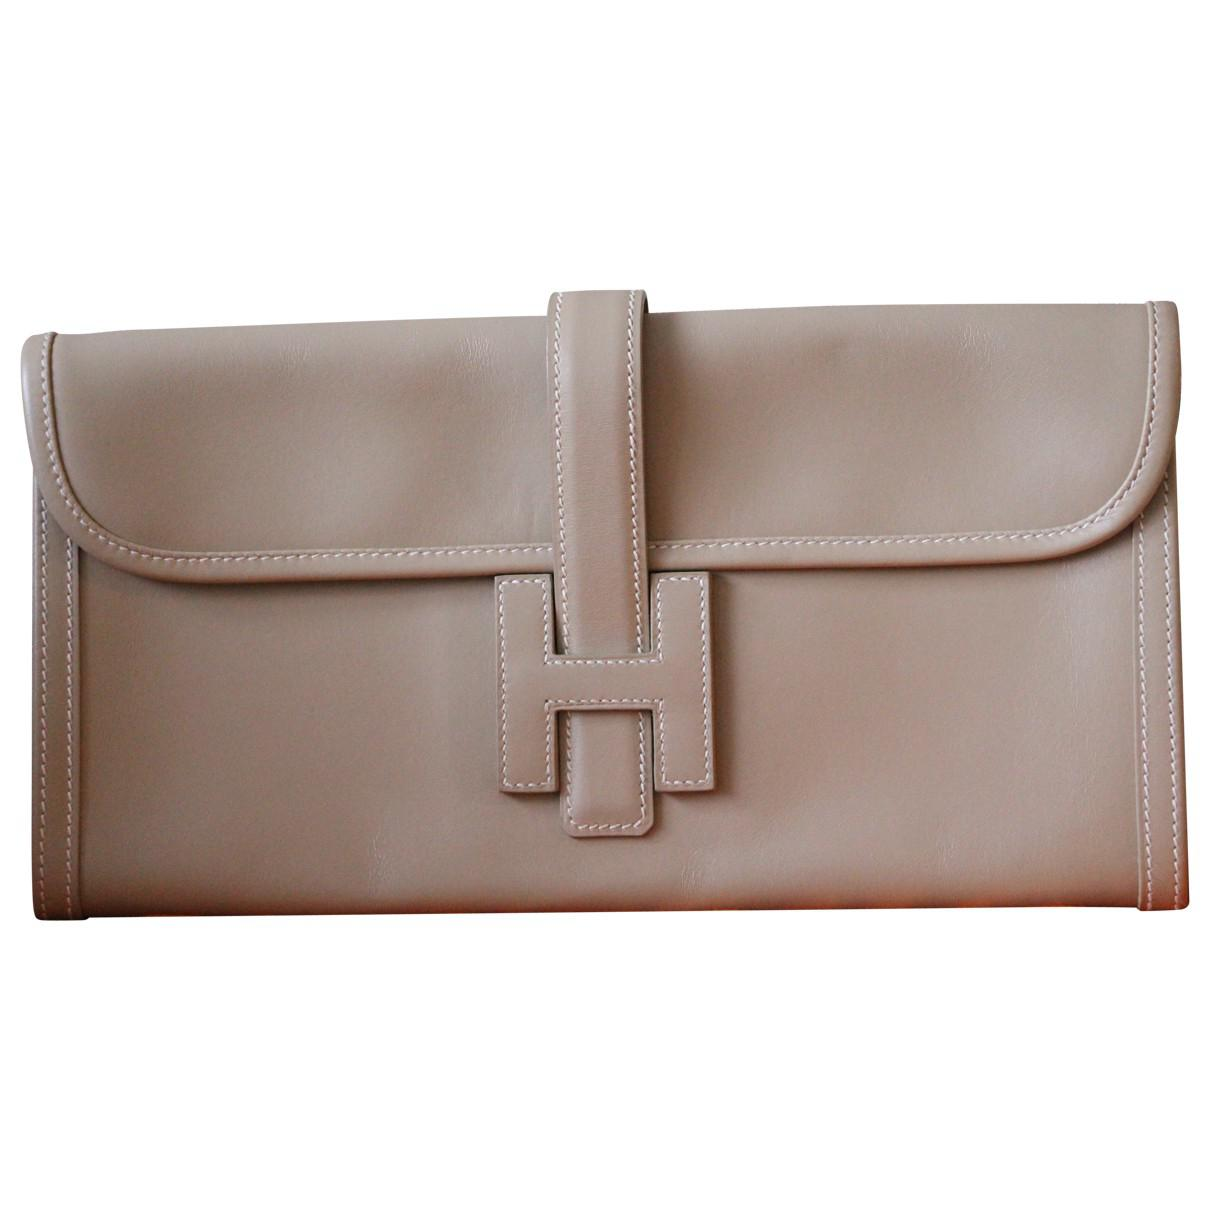 Hermès Pre-owned - Leather clutch bag C0YXCoPZ8